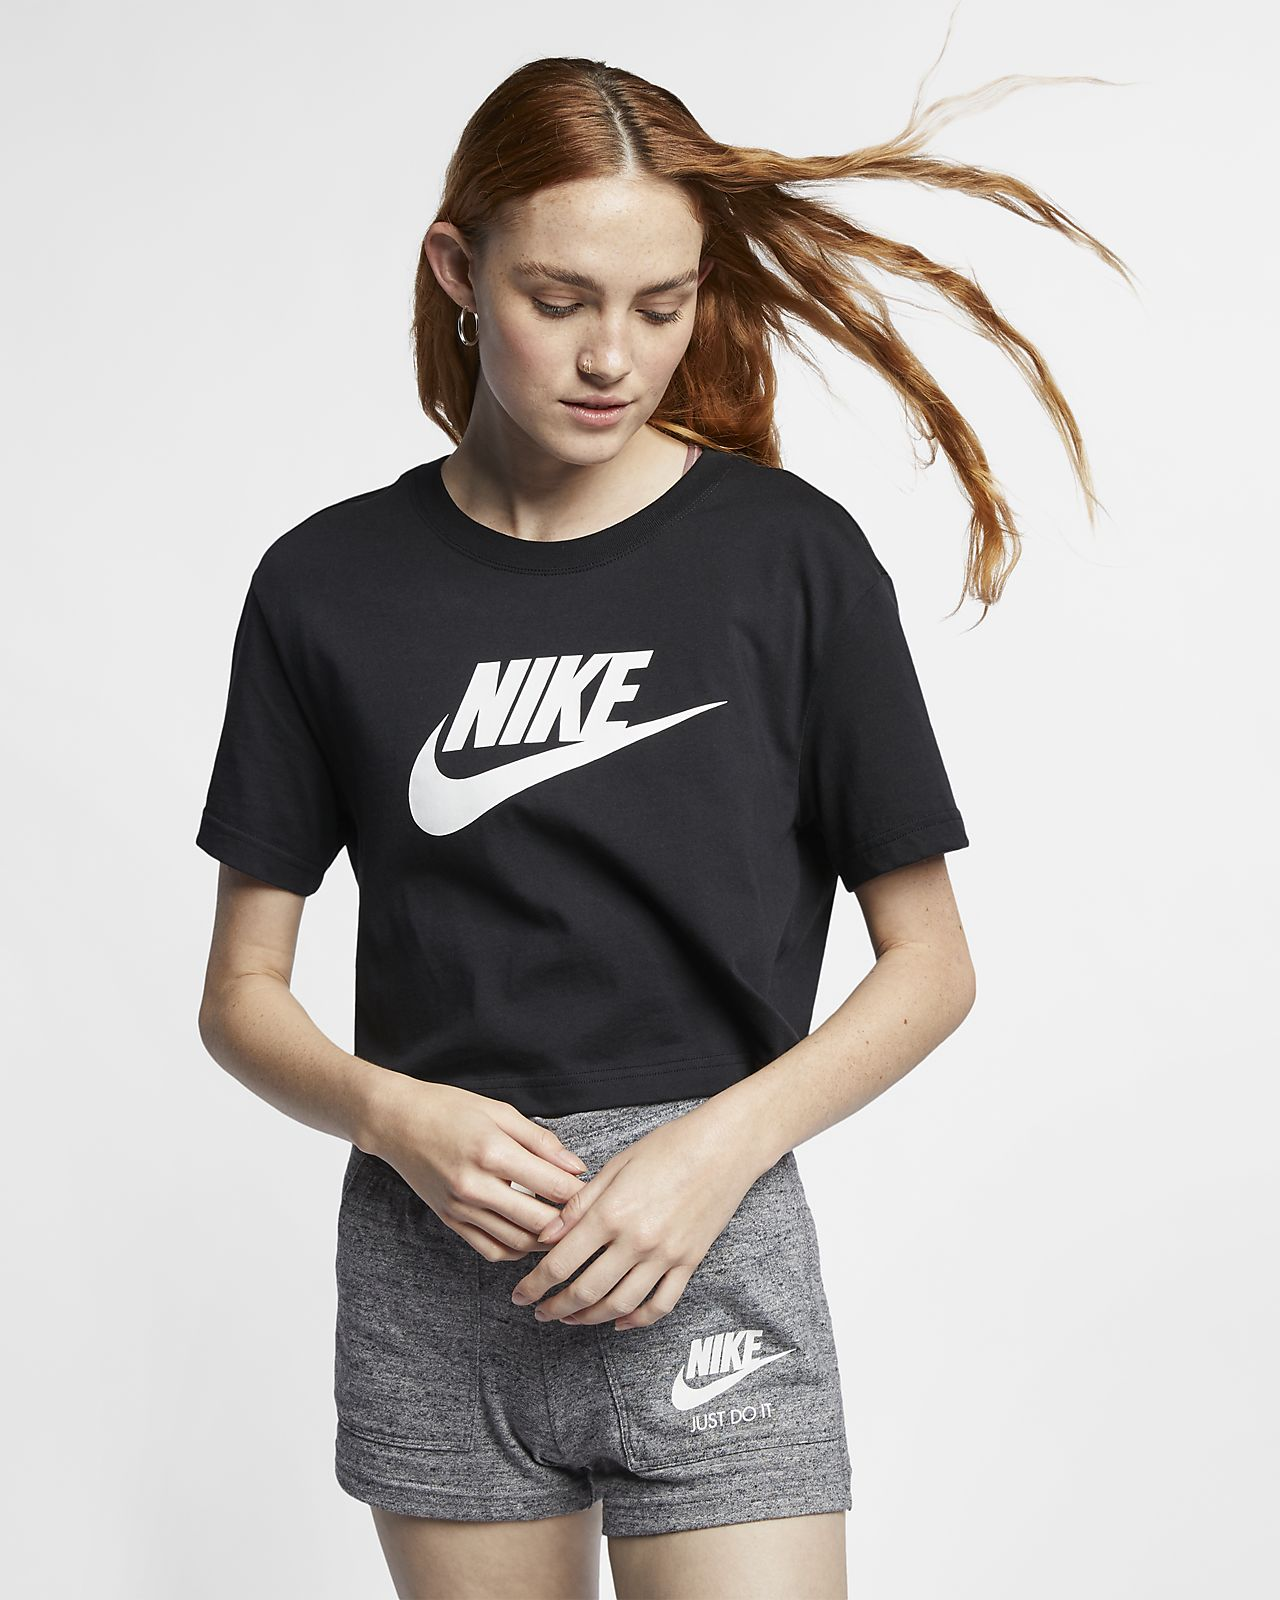 nike shirt girl